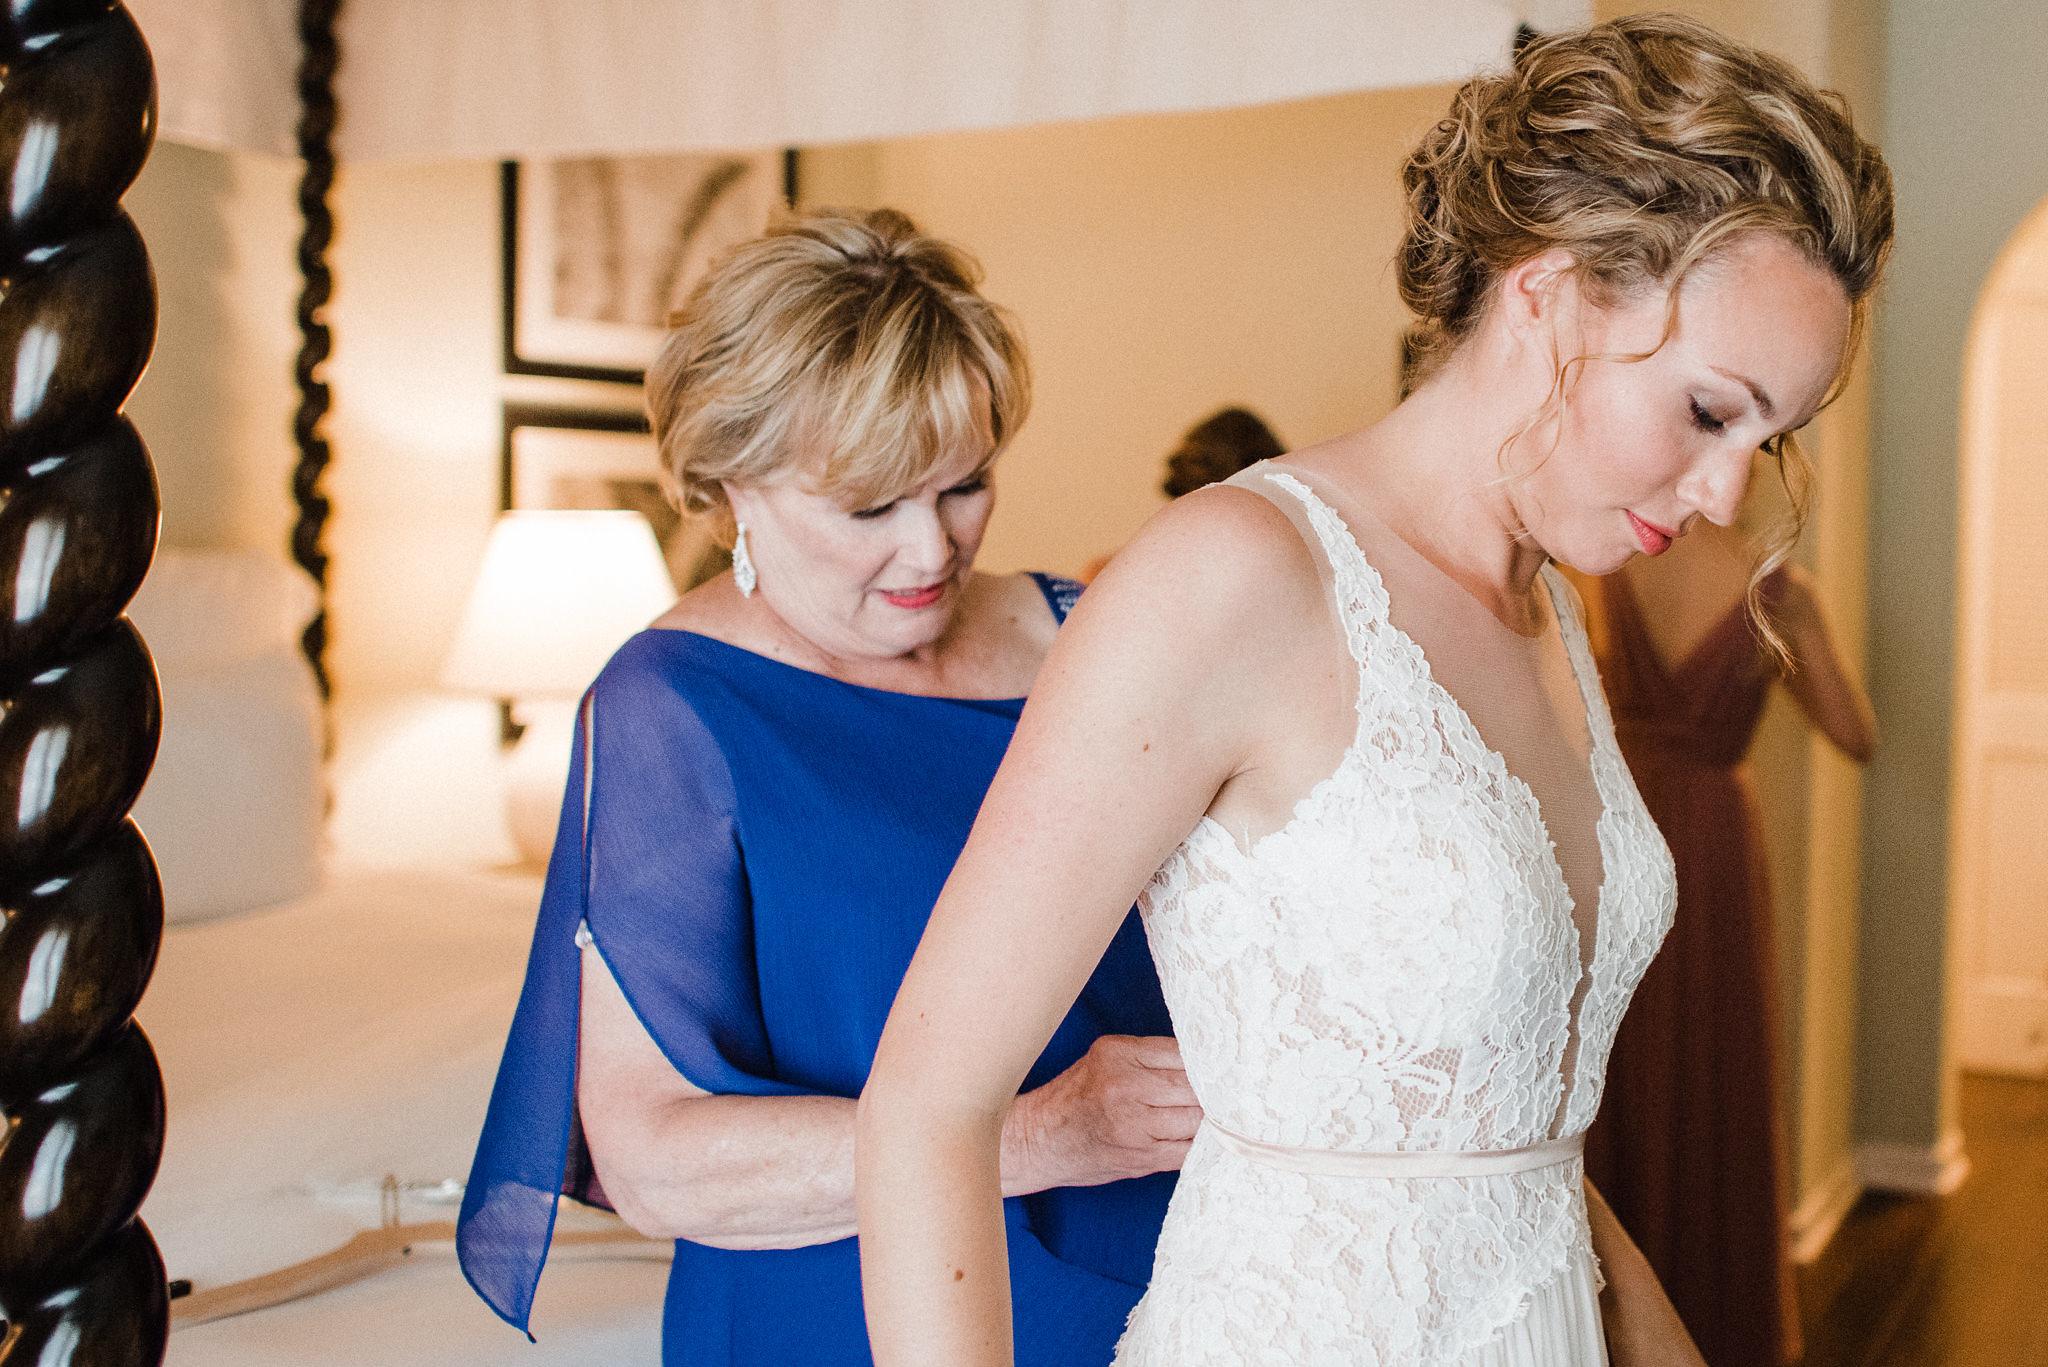 www.santabarbarawedding.com   Grace Kathryn Photography   Mission Rose Garden   Alegria by Design   Ella & Louie   Mother Helps Bride with Wedding Dress